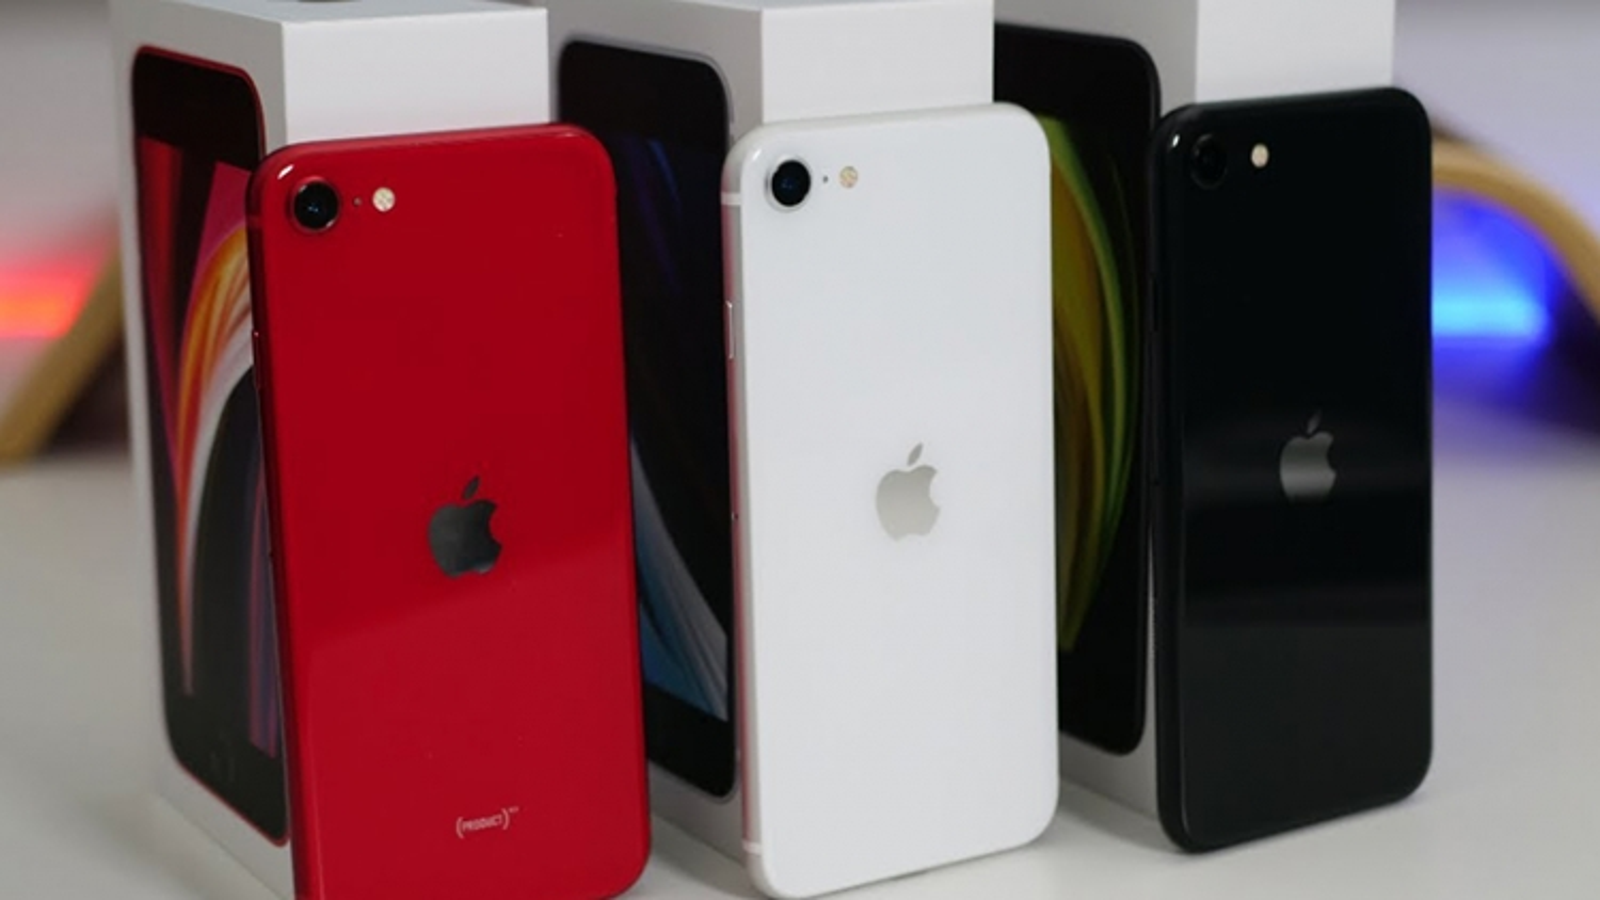 Vì sao Apple lặng lẽ khai tử iPhone SE 256 GB?